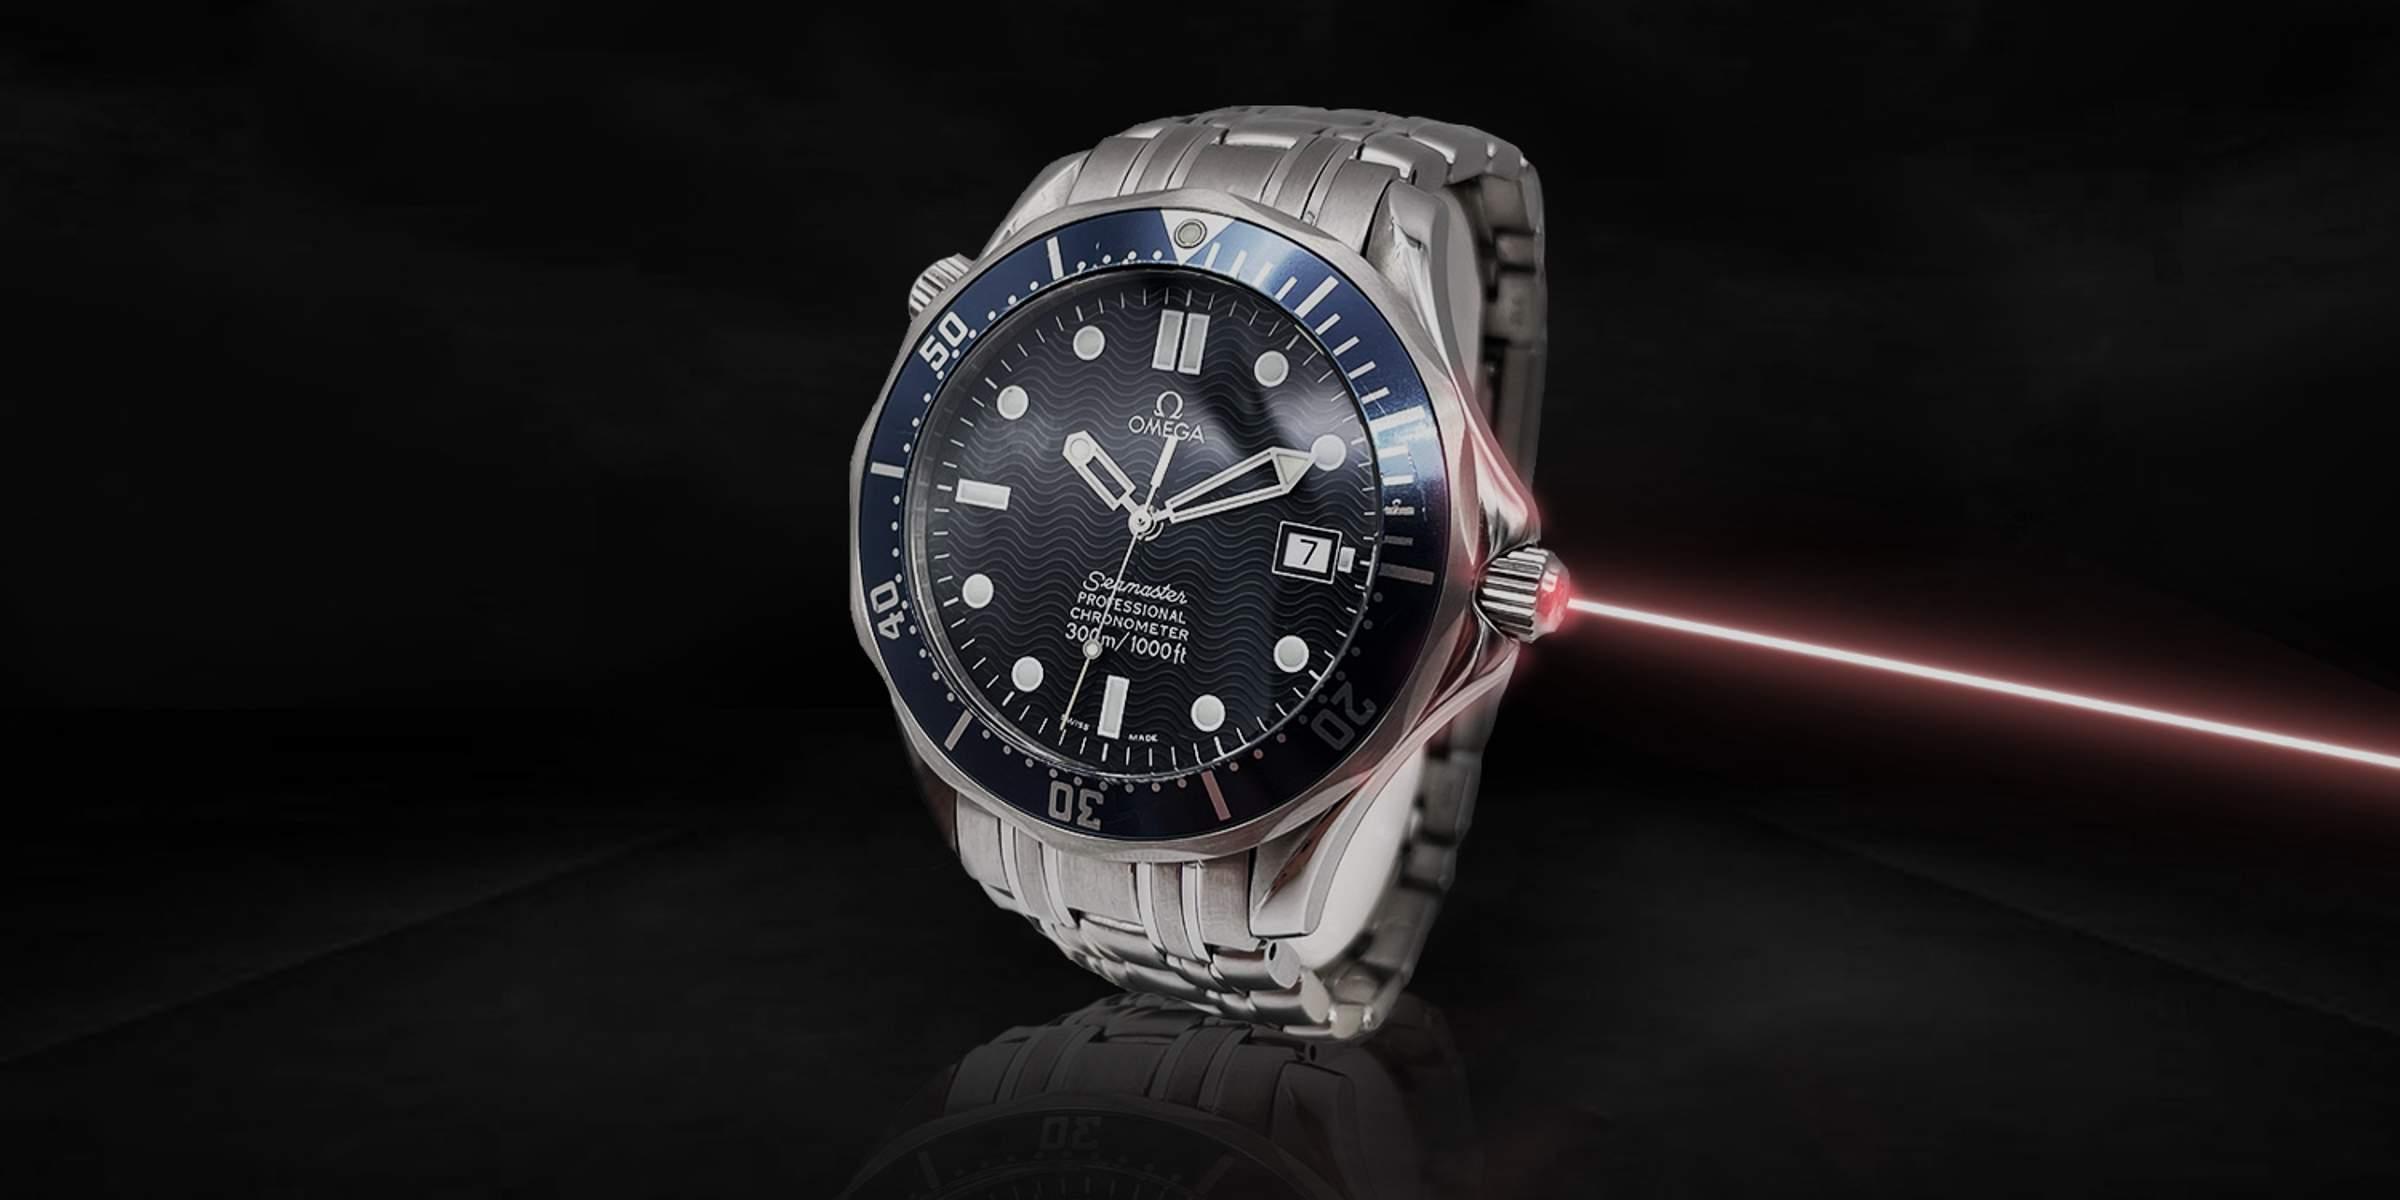 Omega James Bond Watches 2-1